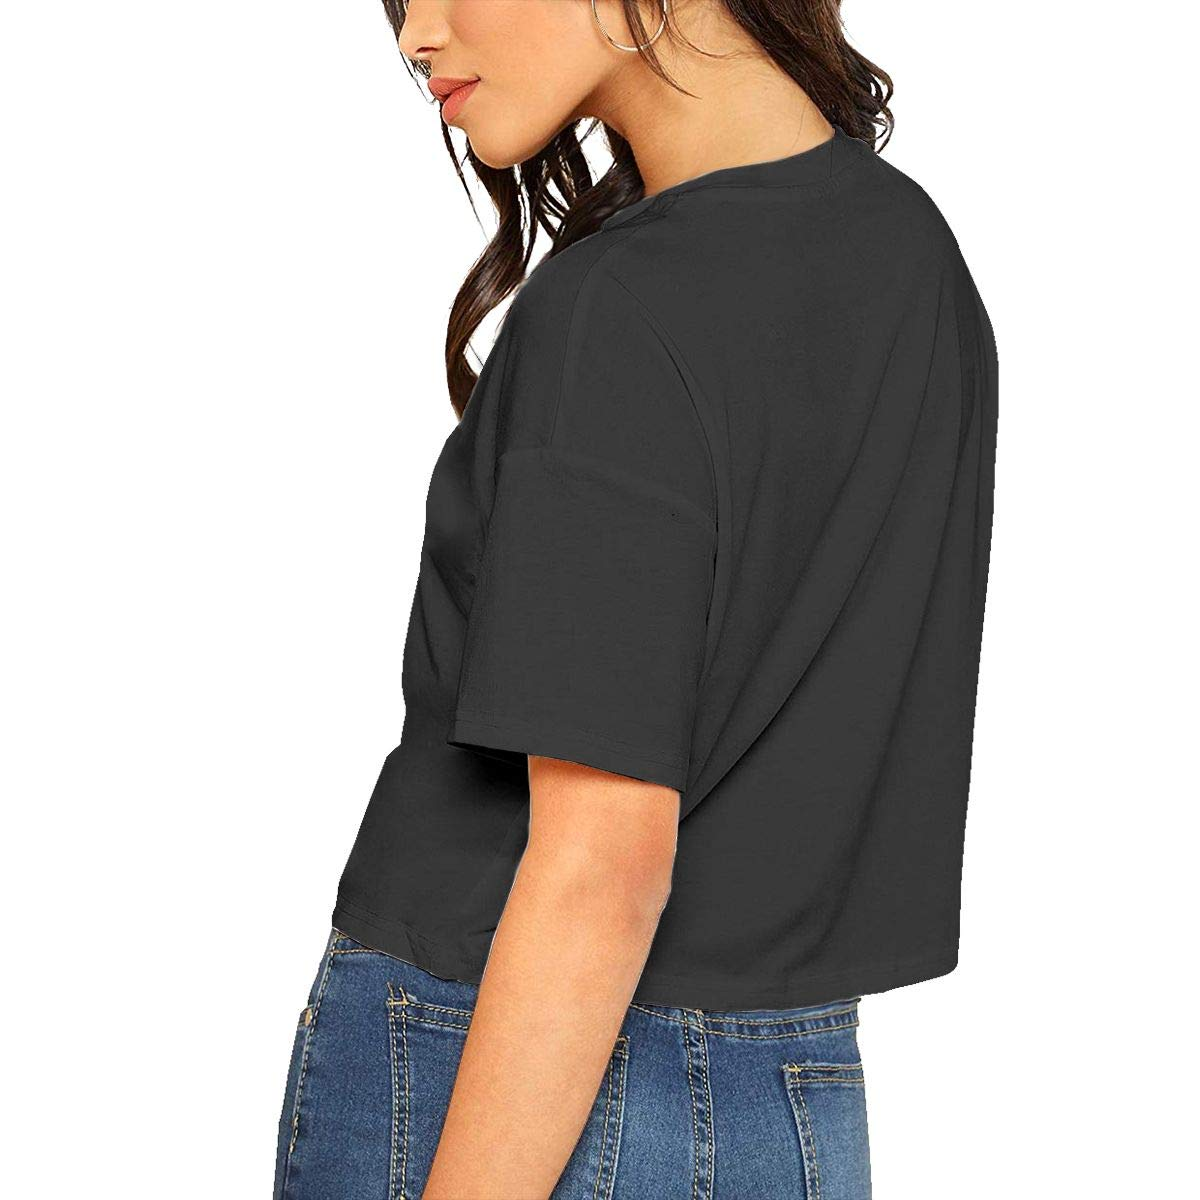 Seuriamin to The Moon T Shirt Bitcoin BTC TRADI Womens Fashion Short Sleeve Leak Navel Crew Neck T Shirts